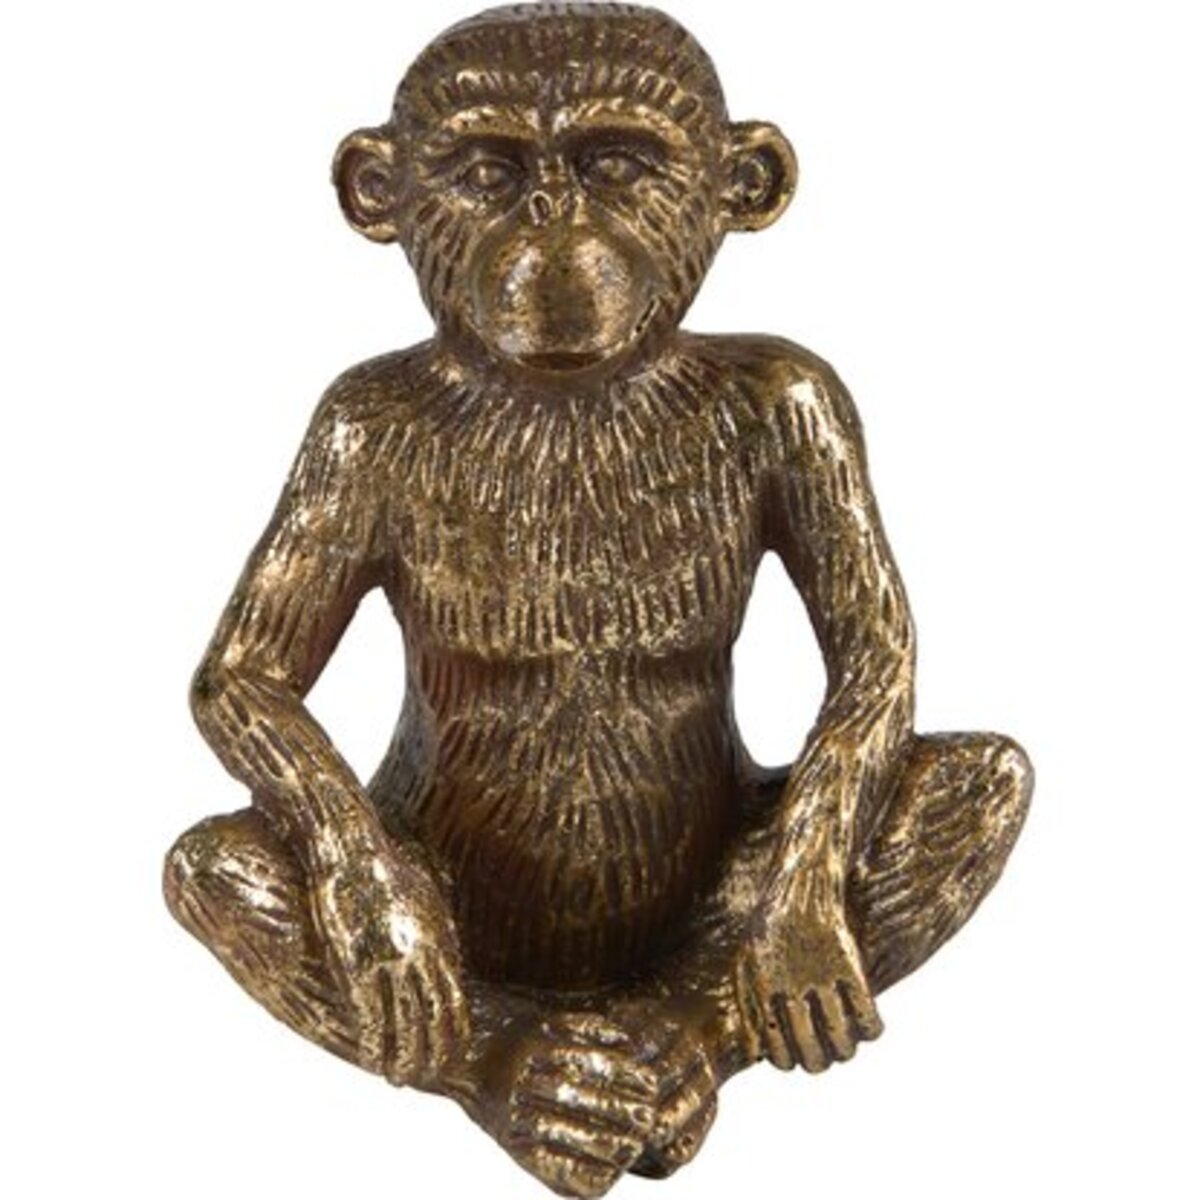 Bild 1 von Deko-Figur Affe Sitzend Safari Lodge 11 cm Gold